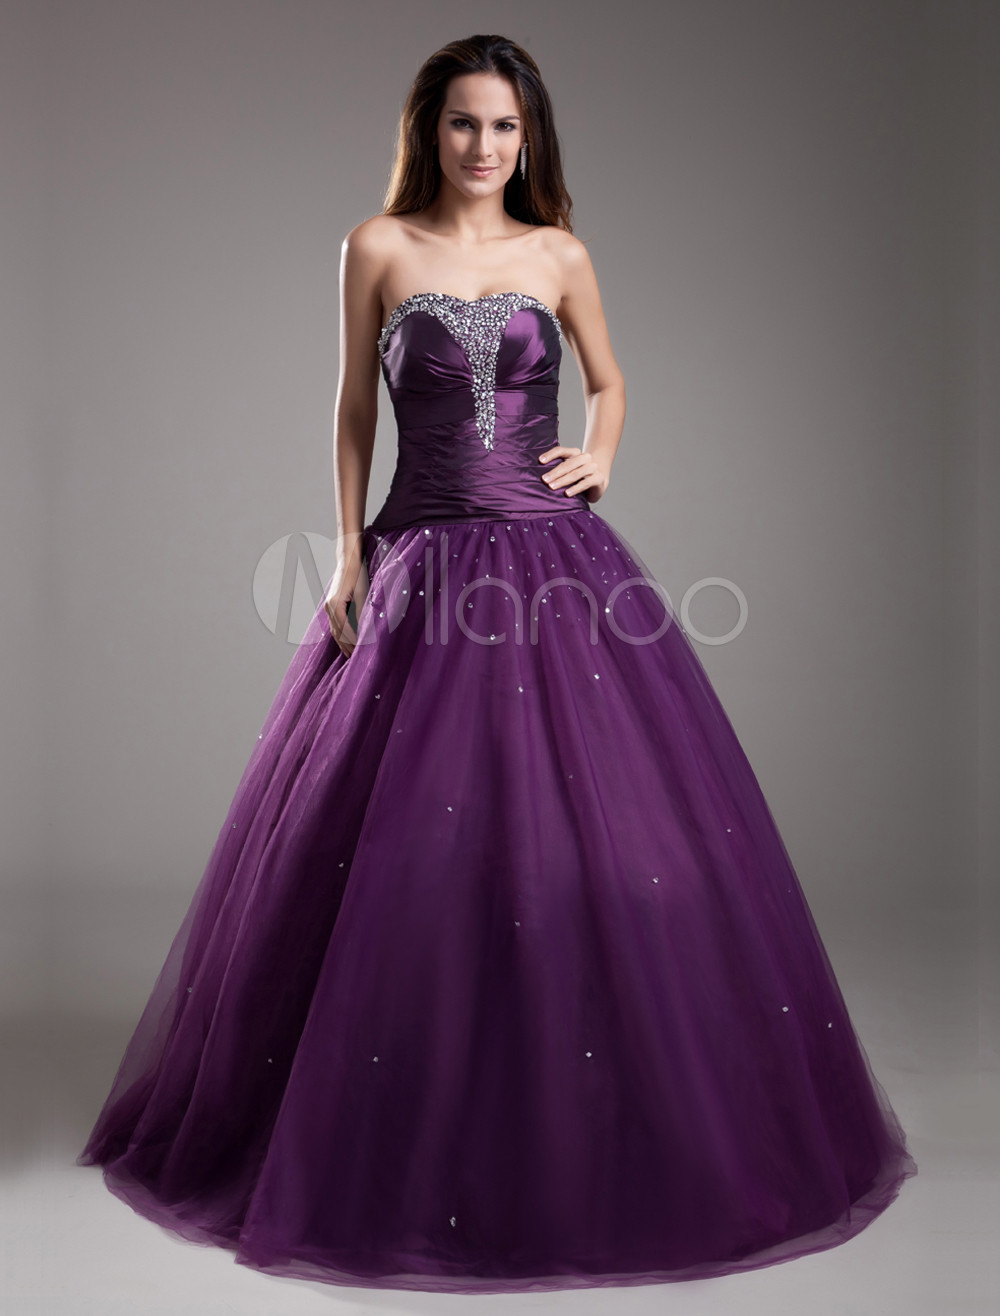 Formal Grape Beading Tulle Sweetheart Neck Ball Gown - Milanoo.com